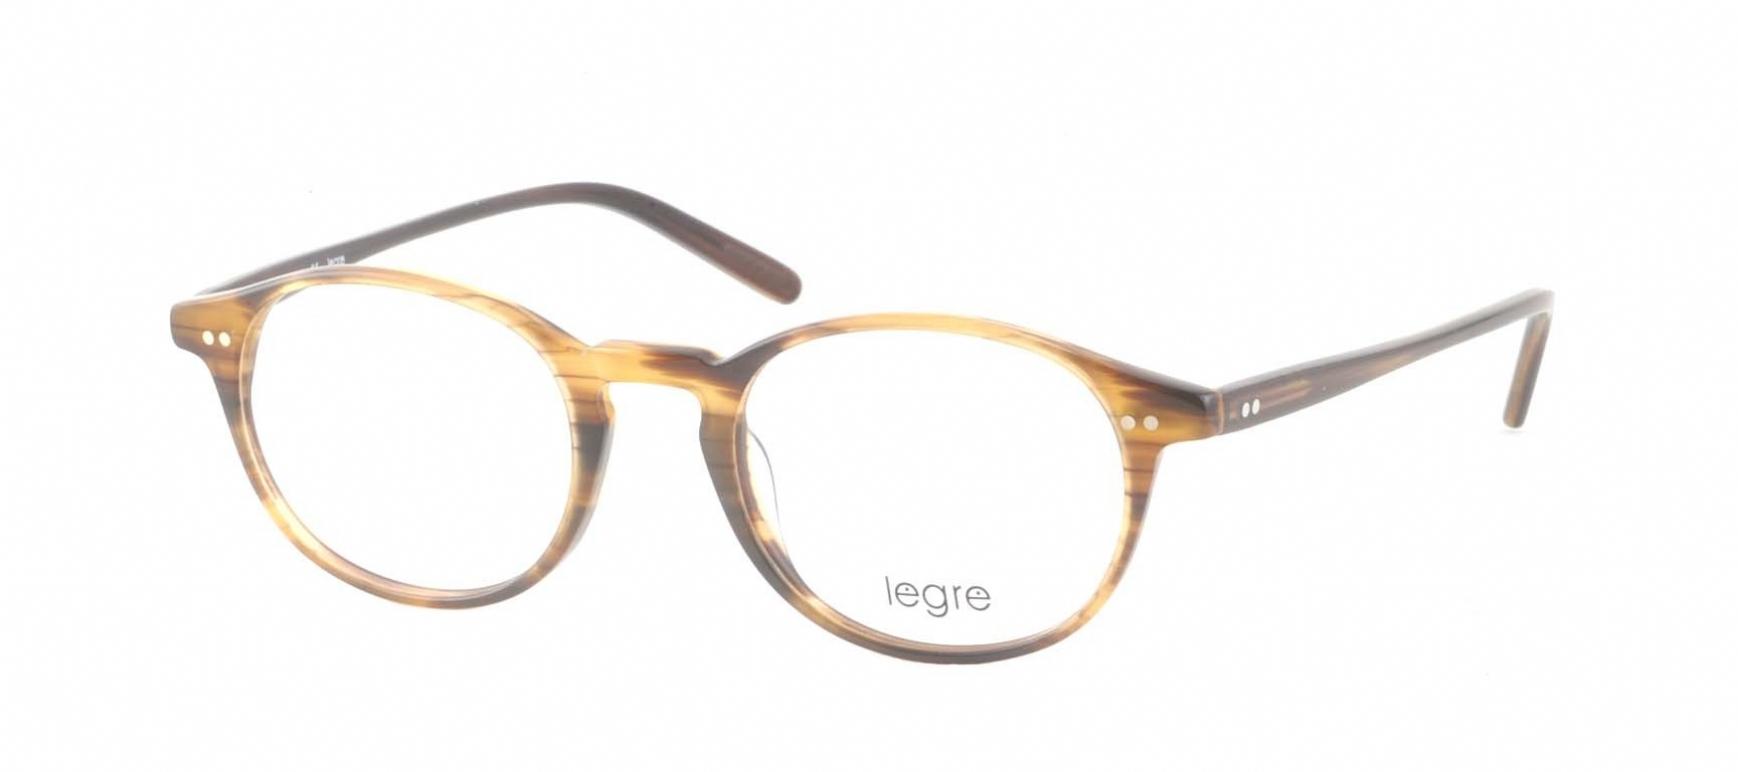 ba1fbb3d93f5 Buy Legre Eyeglasses directly from OpticsFast.com